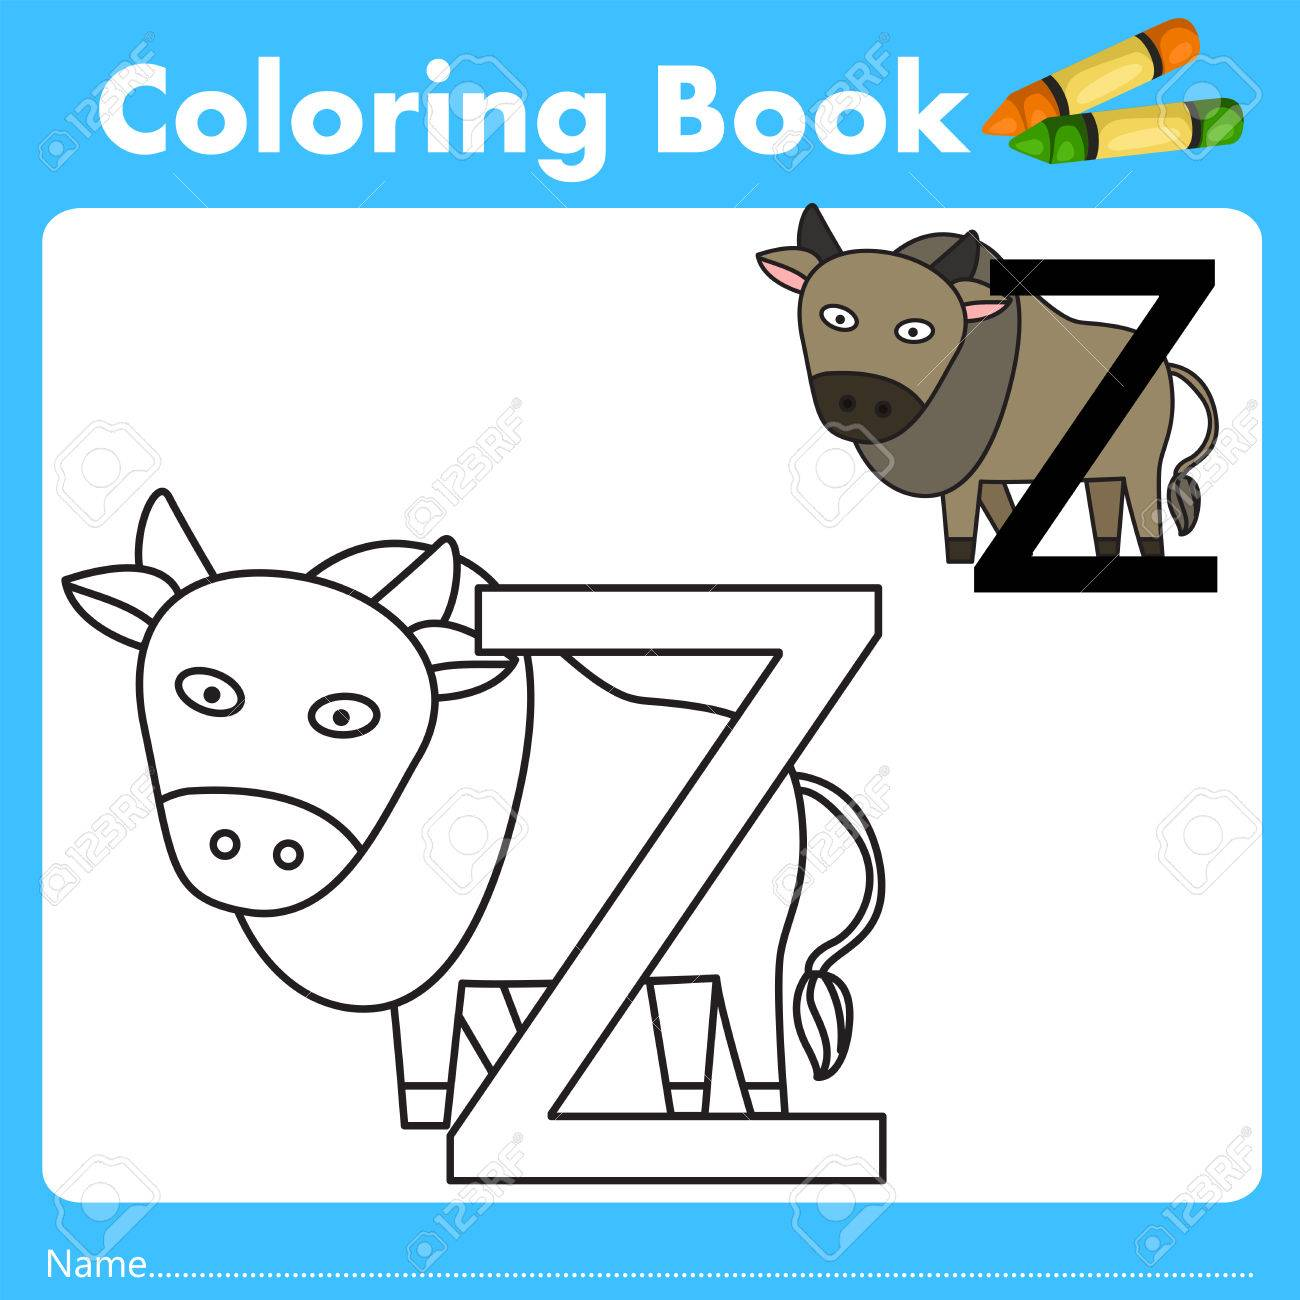 Book color illustrator - Illustrator Of Color Book With Zebu Animal Stock Vector 66958056